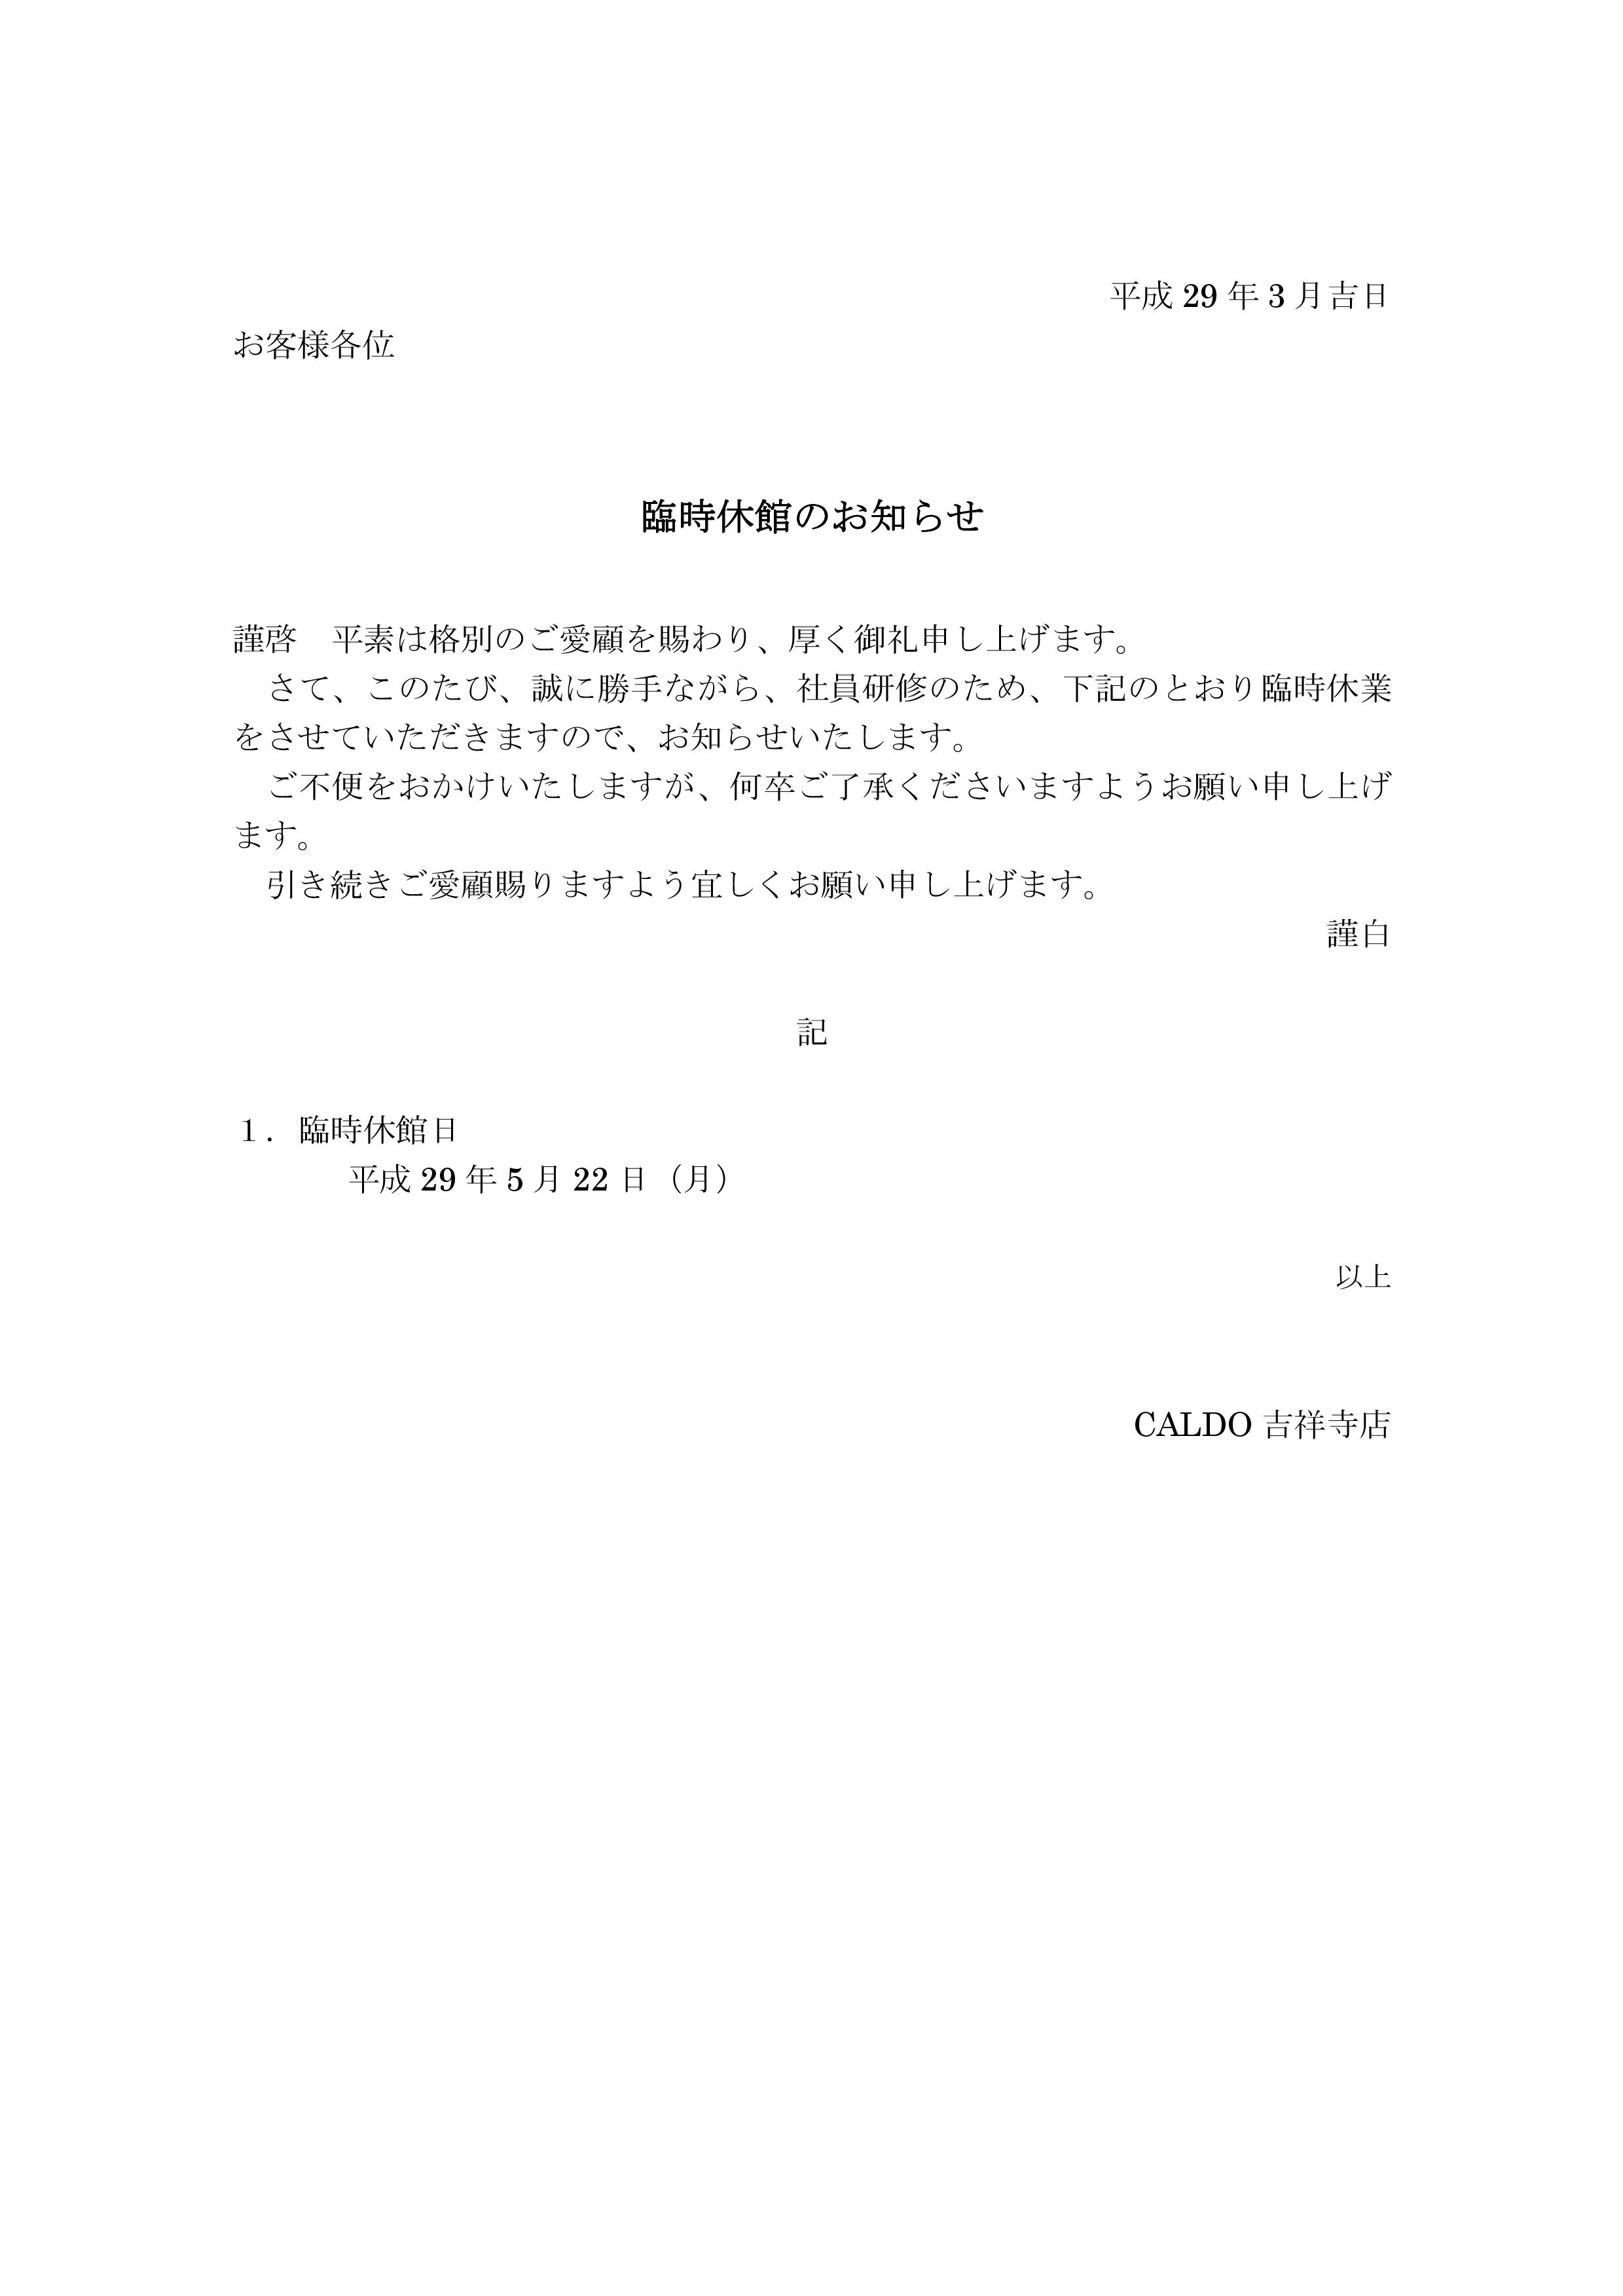 Microsoft Word - 170321 臨時休館のお知らせ